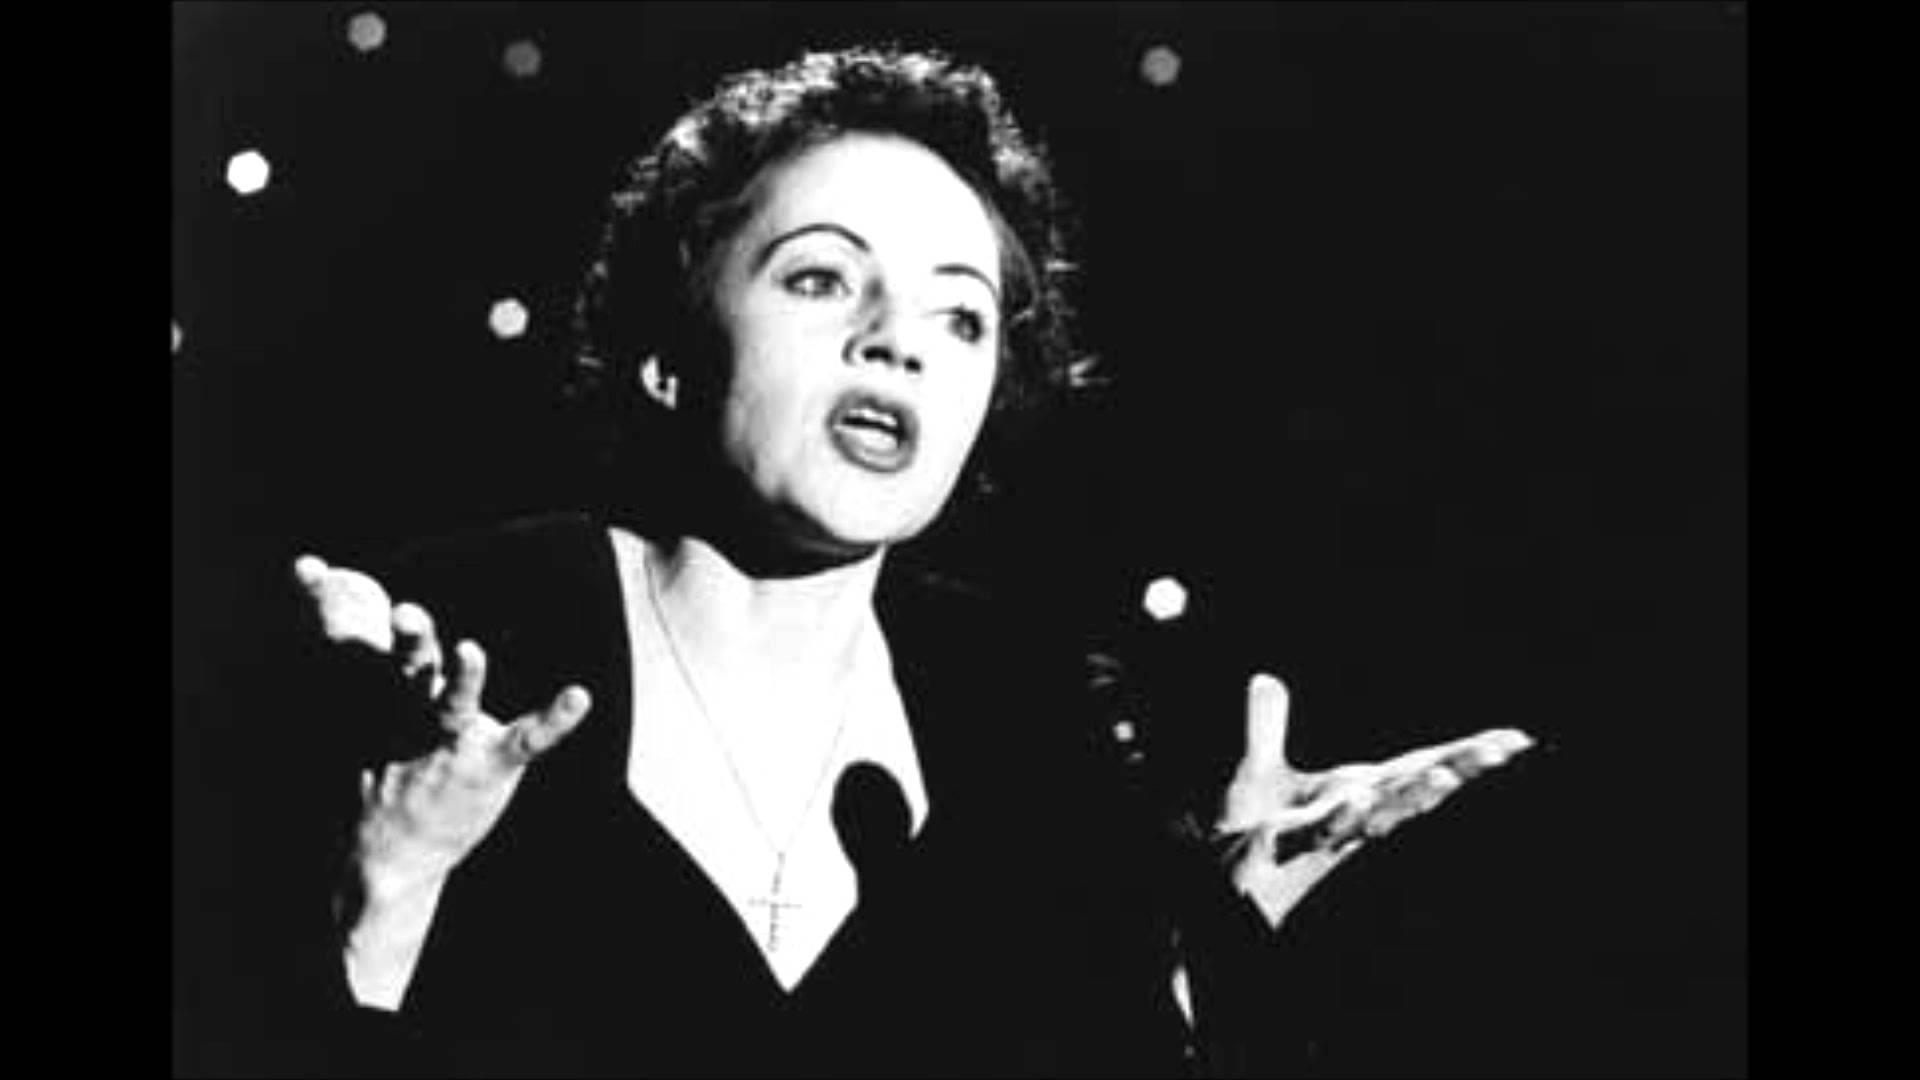 La Marseillaise - Edith Piaf